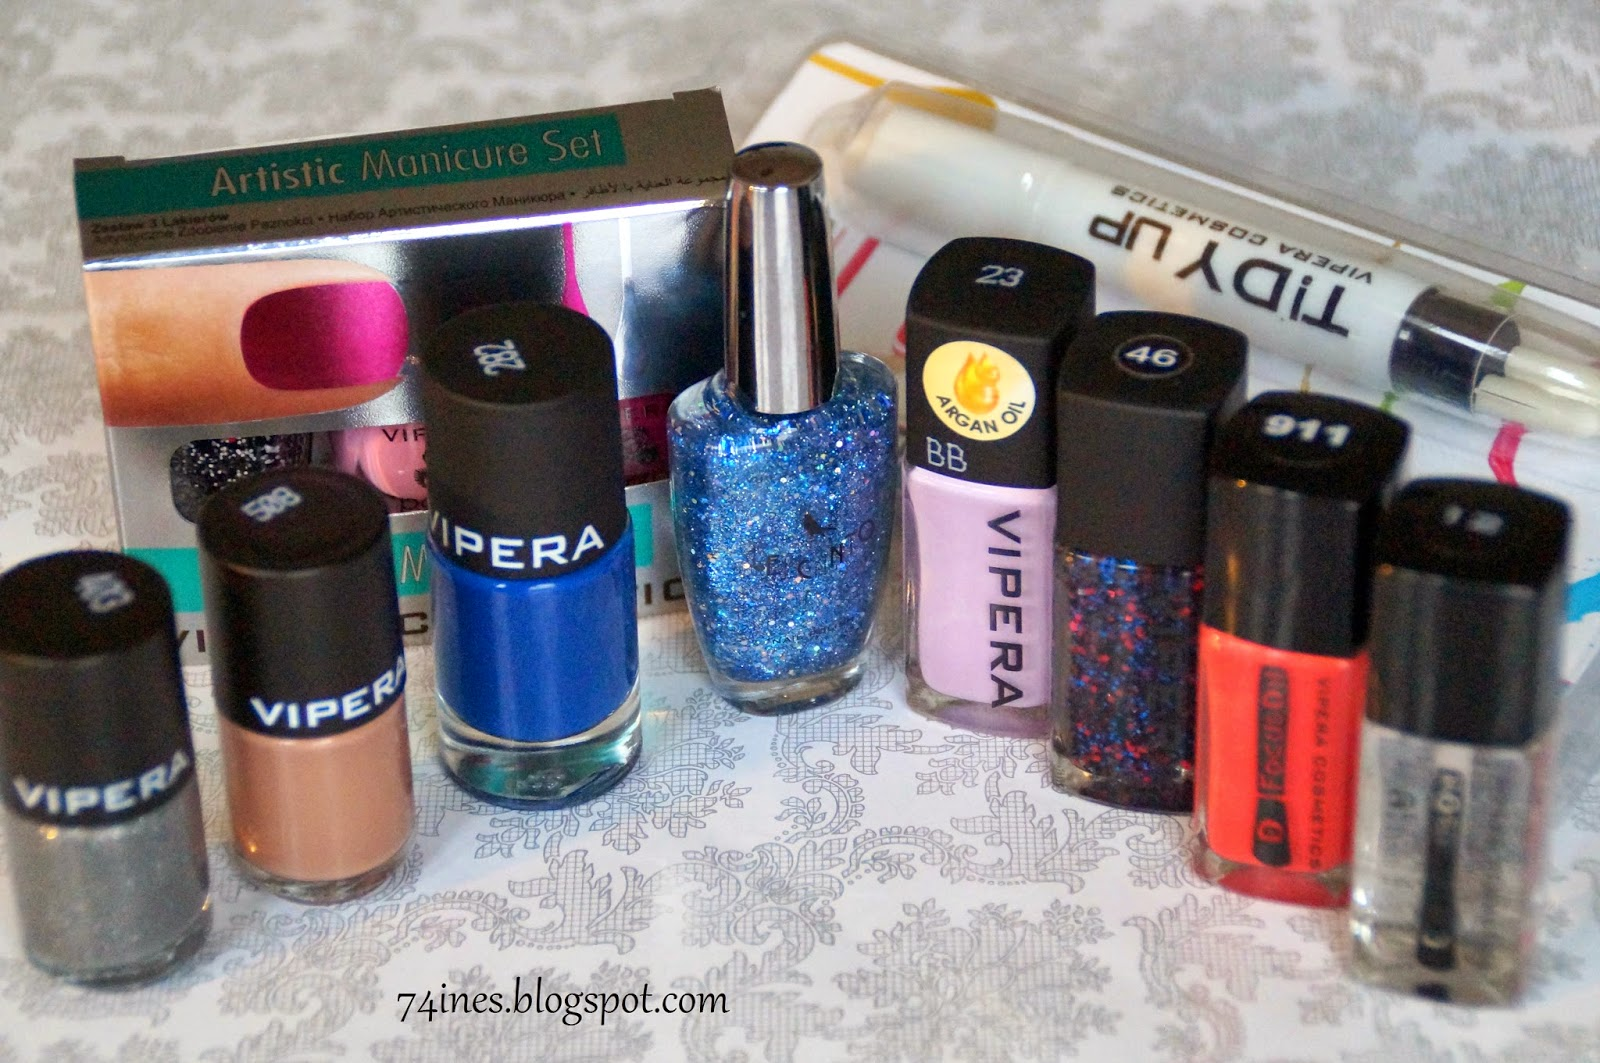 http://74ines.blogspot.com/2014/10/ambasadorski-zestaw-vipera-cosmetics.html